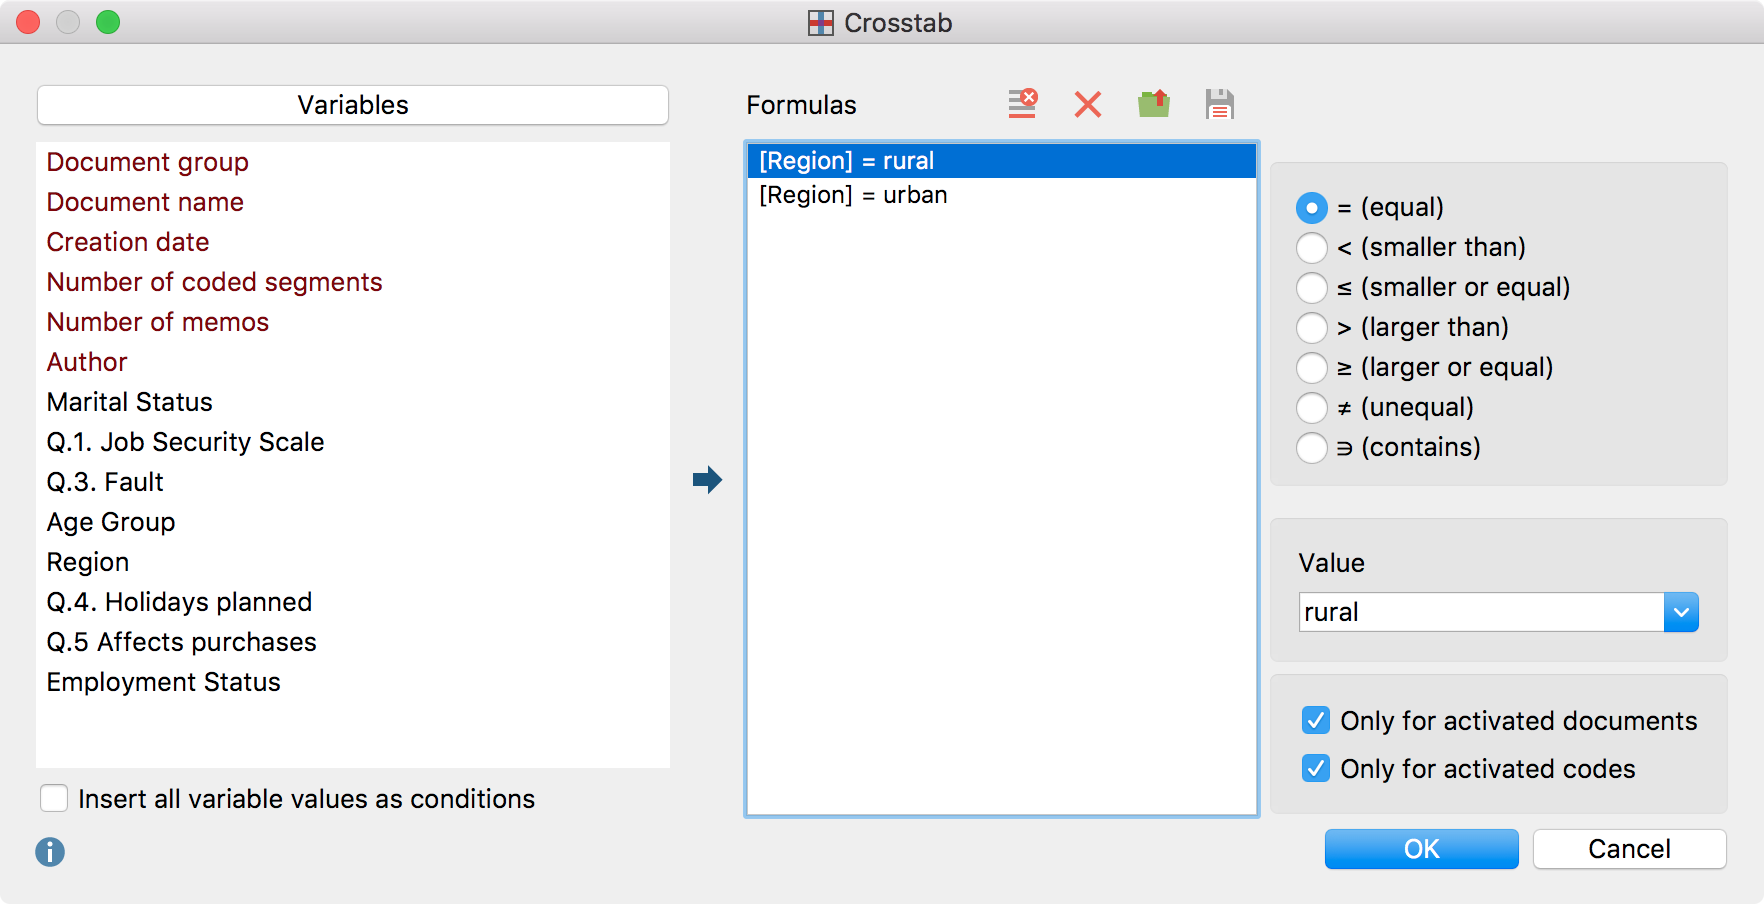 The Crosstab dialog window